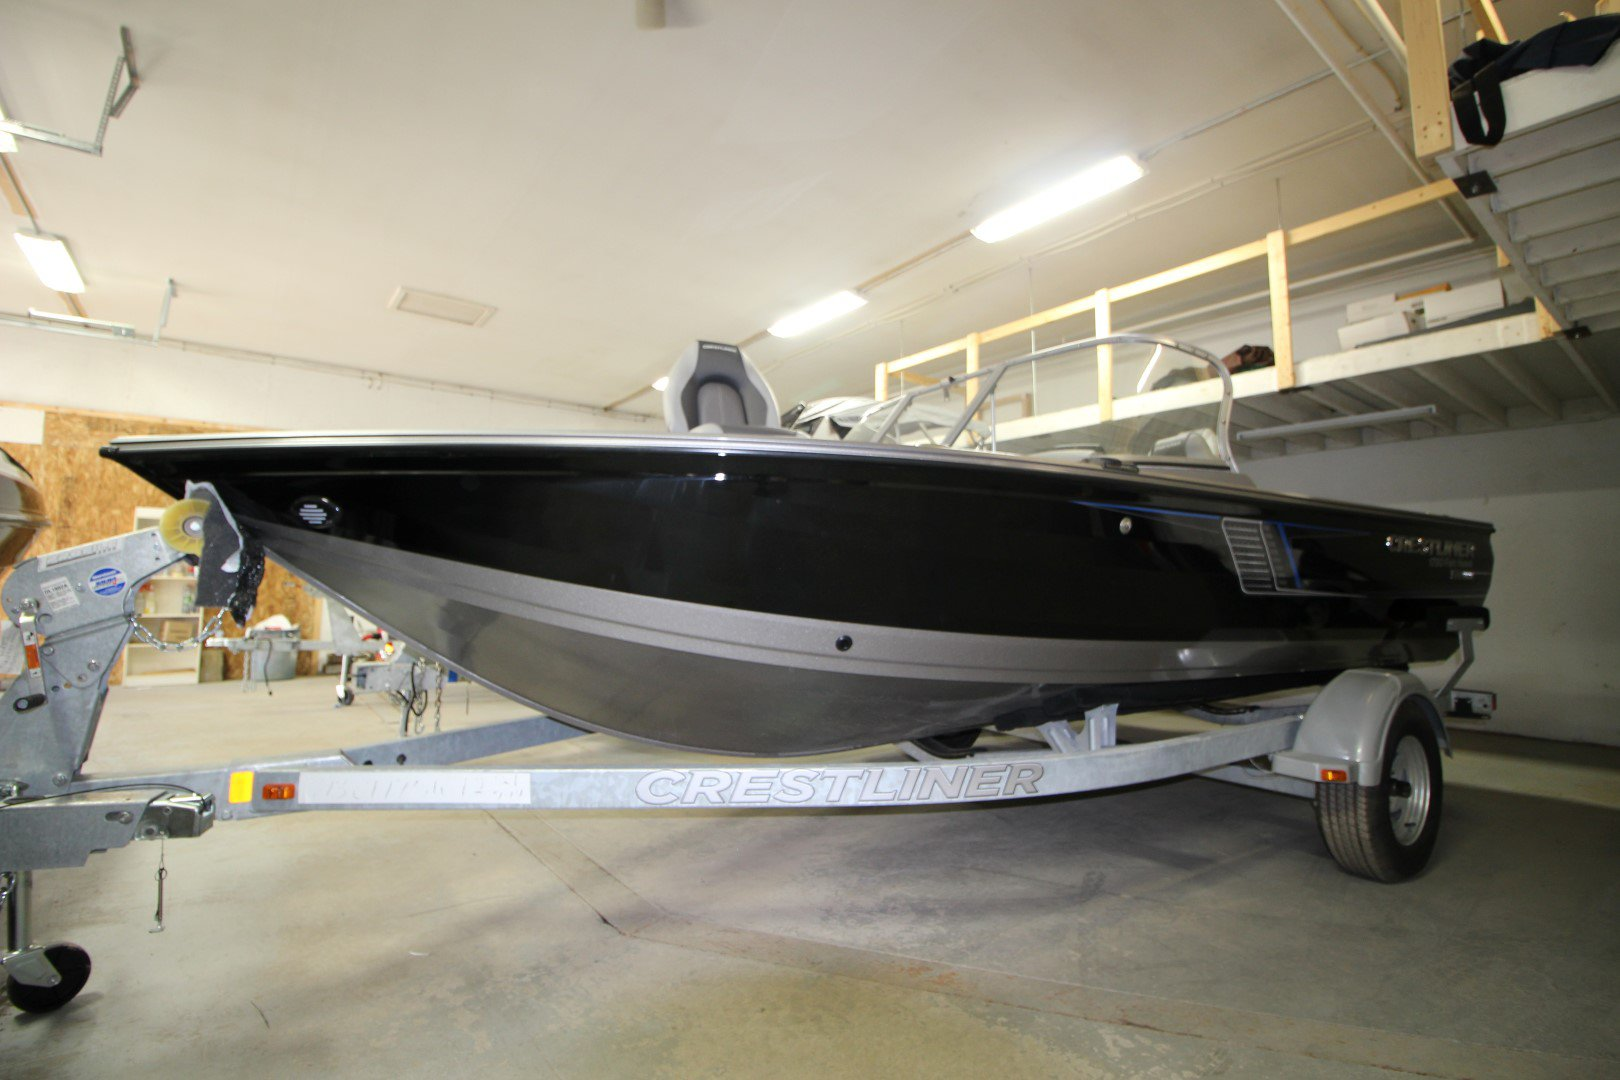 Crestliner FishHawk 1750 WT - IMG_2196